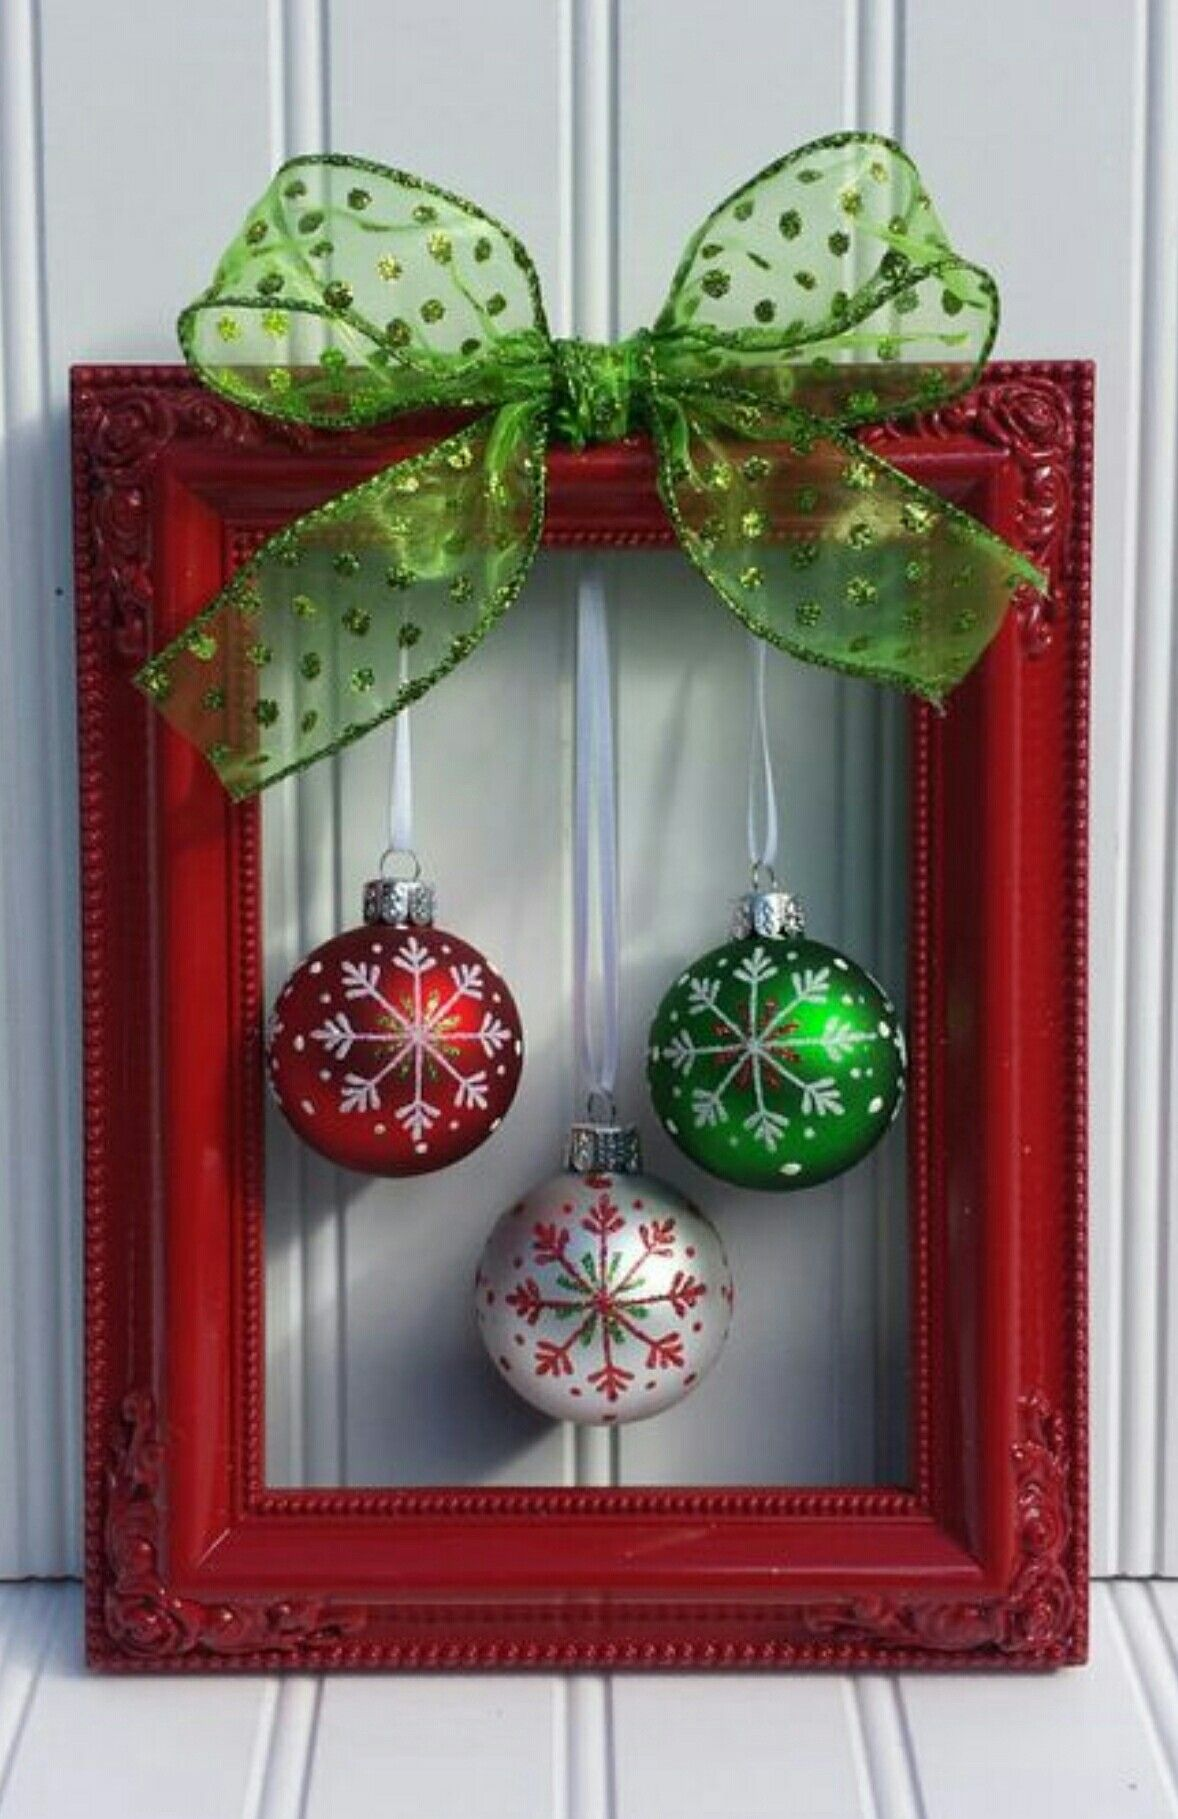 Quick Christmas craft